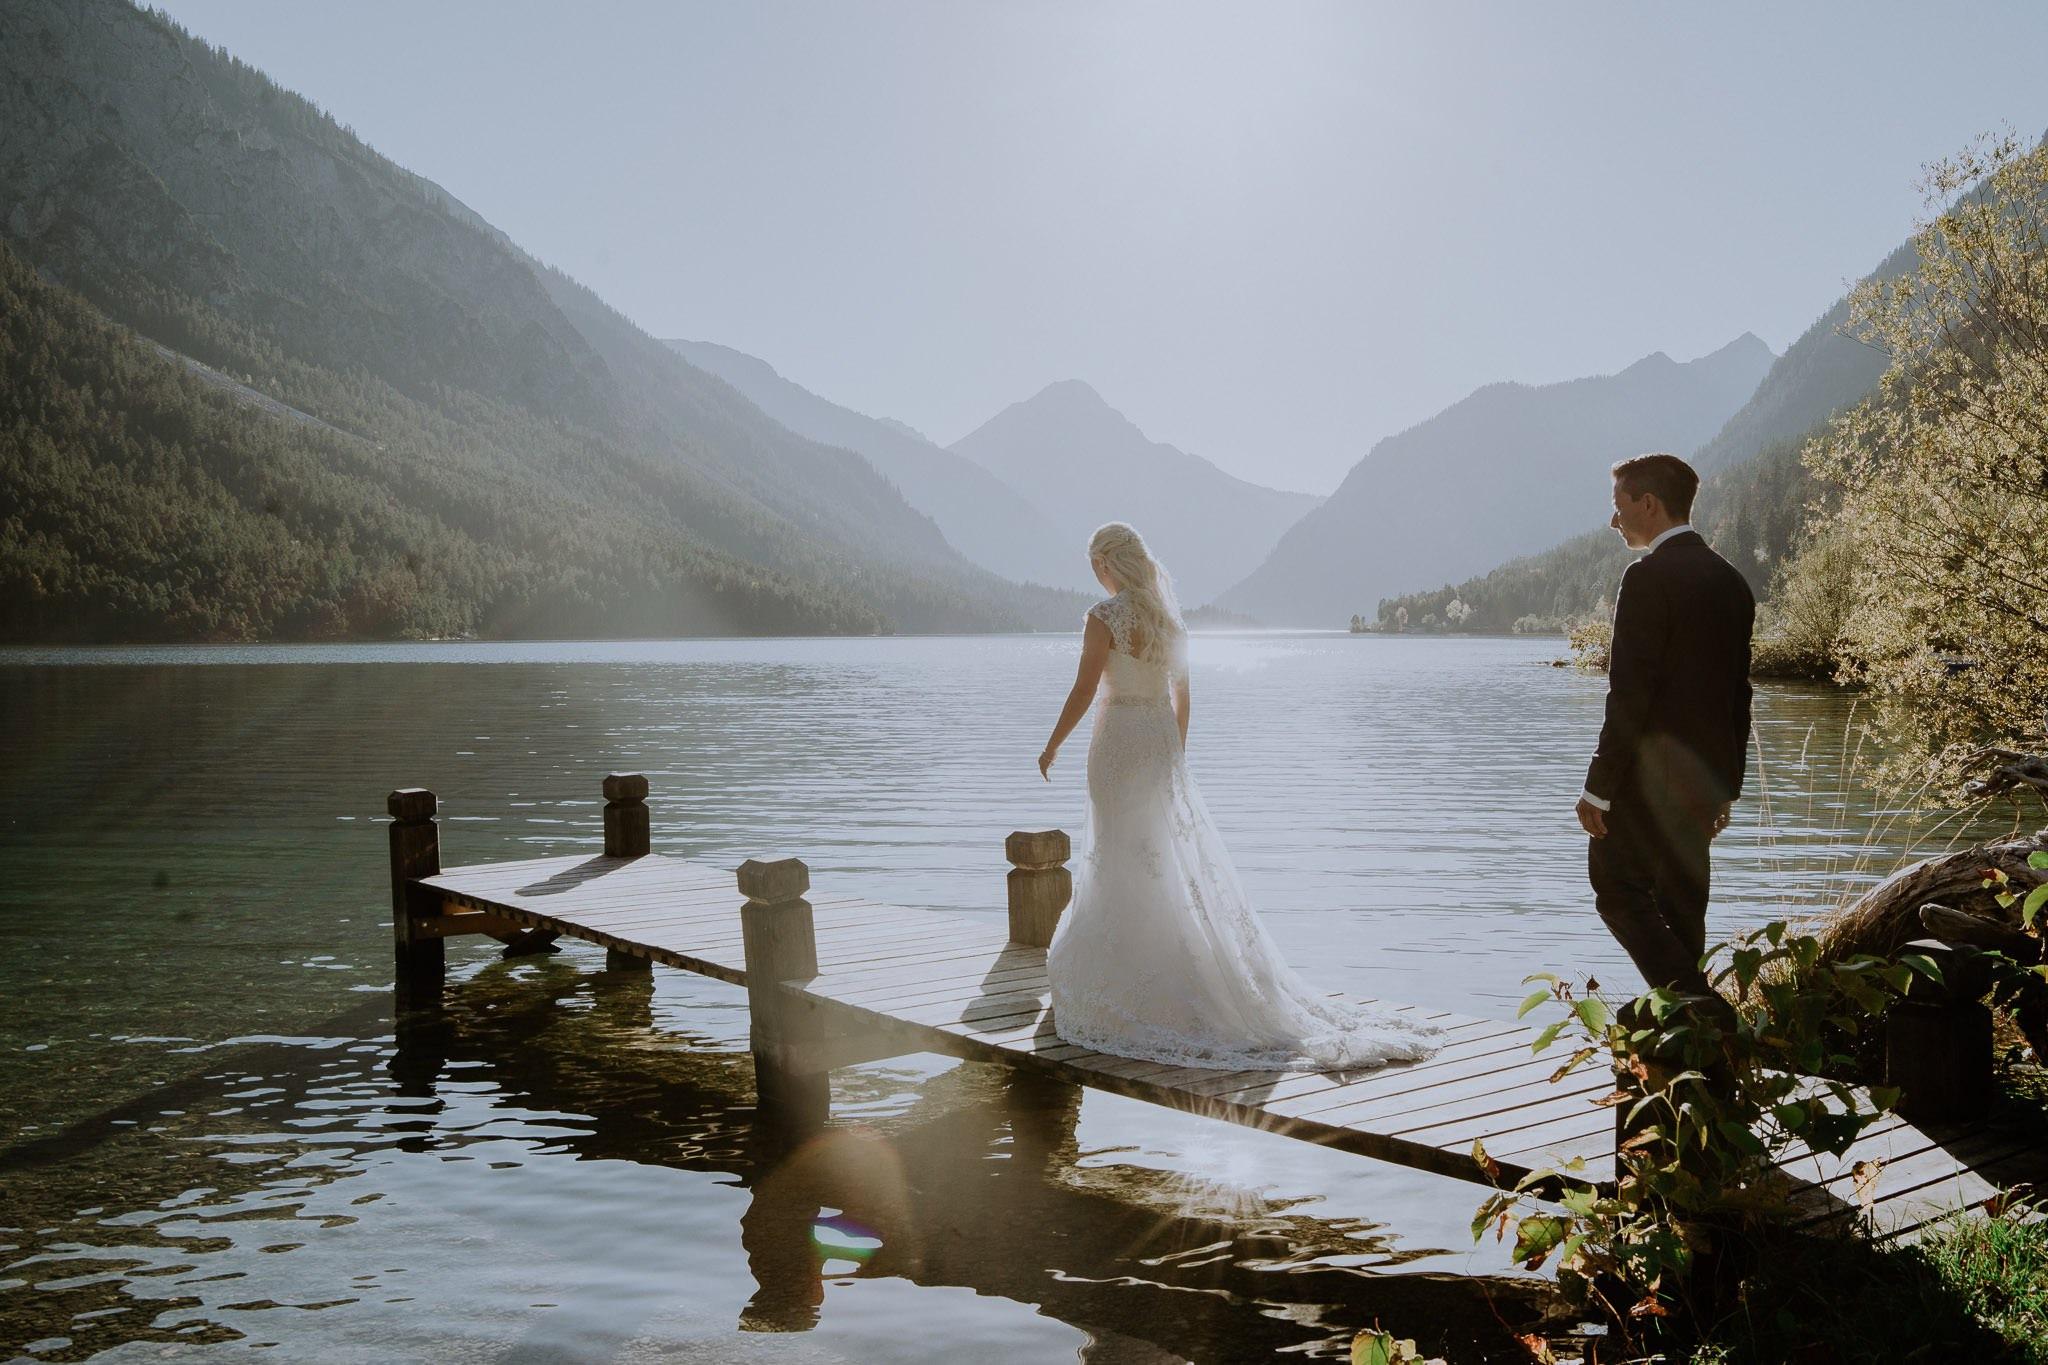 wedding photographer hamilton new zealand 10